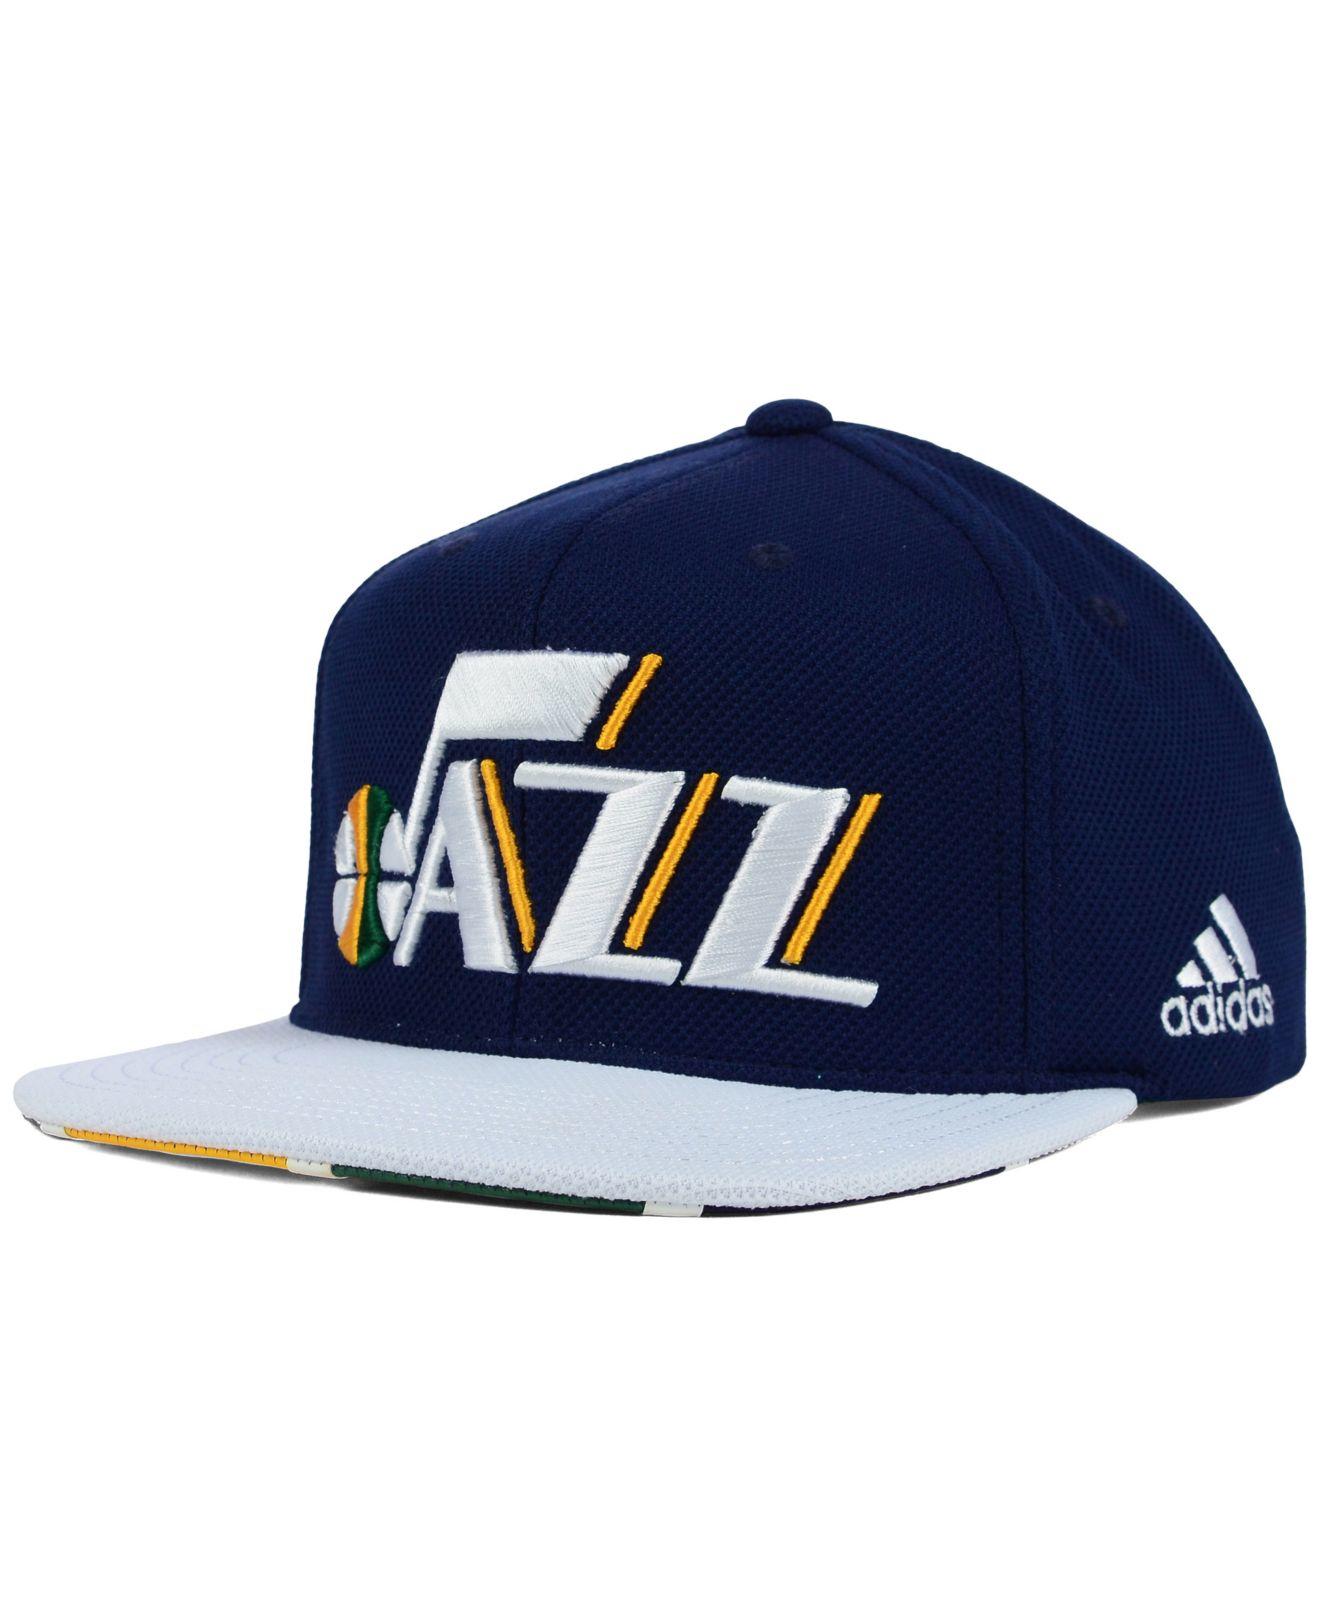 6307f83c4ecc7 ... free shipping lyst adidas utah jazz 2015 nba draft snapback cap in blue  for men a605d